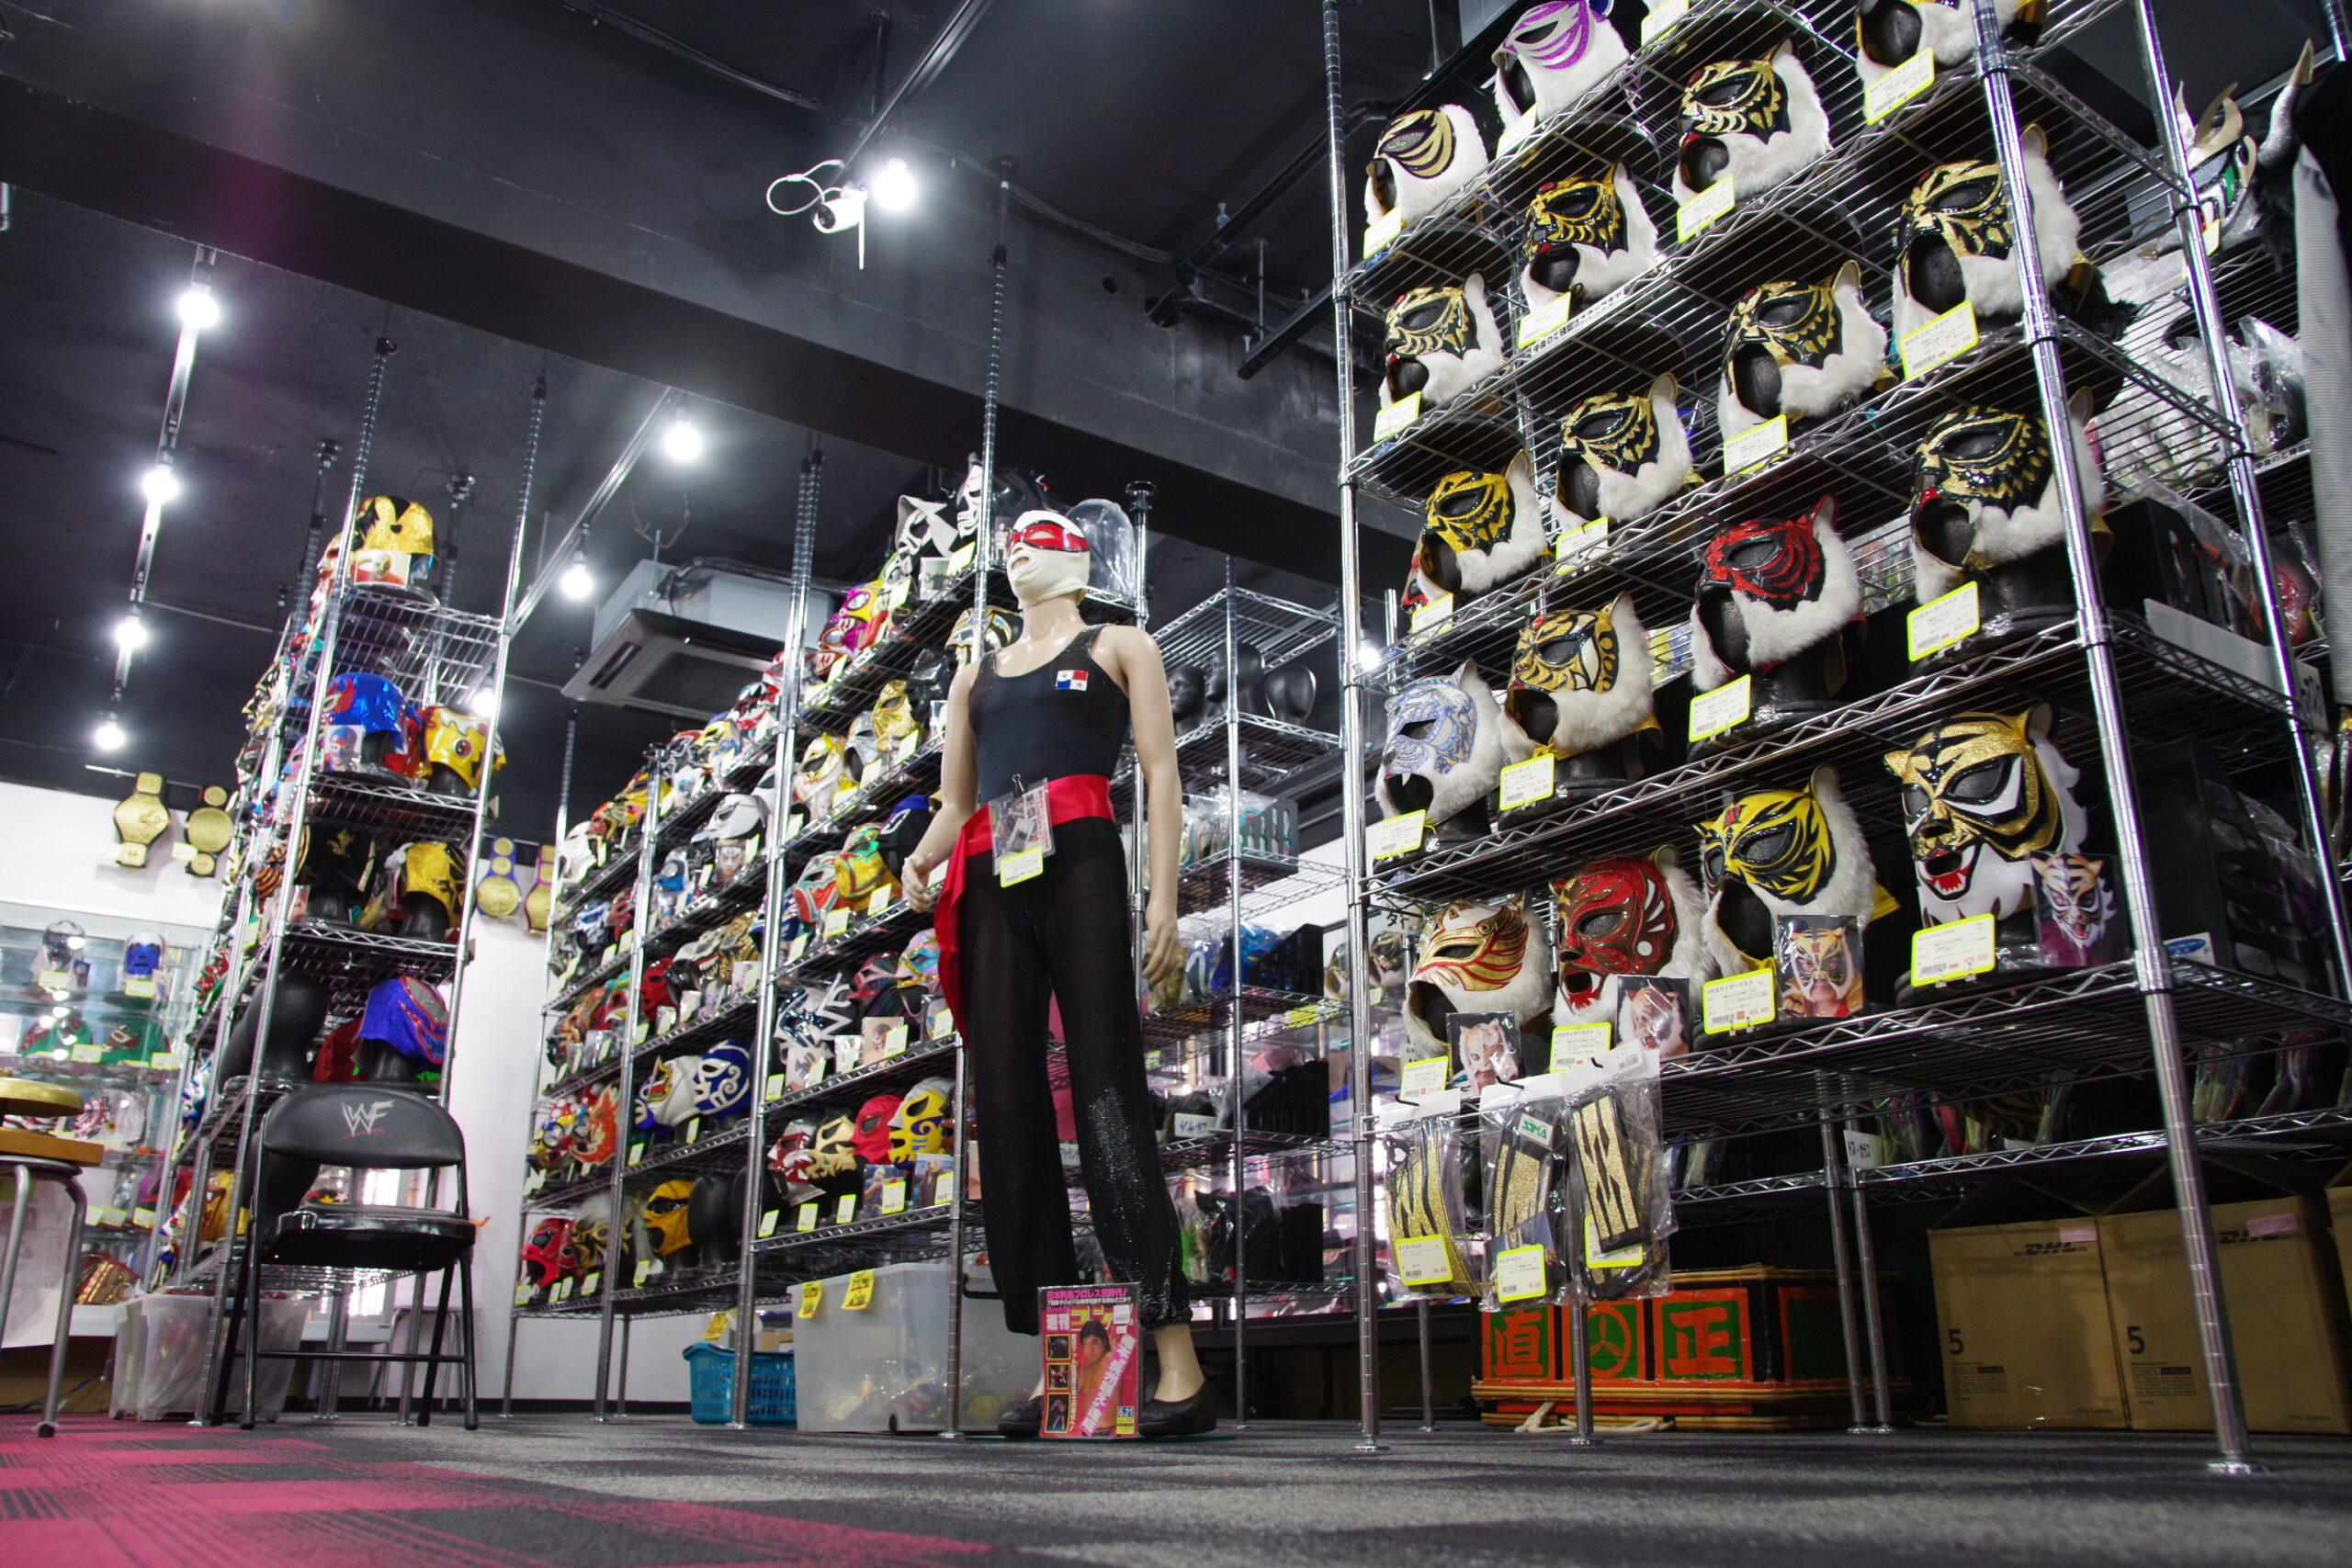 Toudoukan wrestling store items